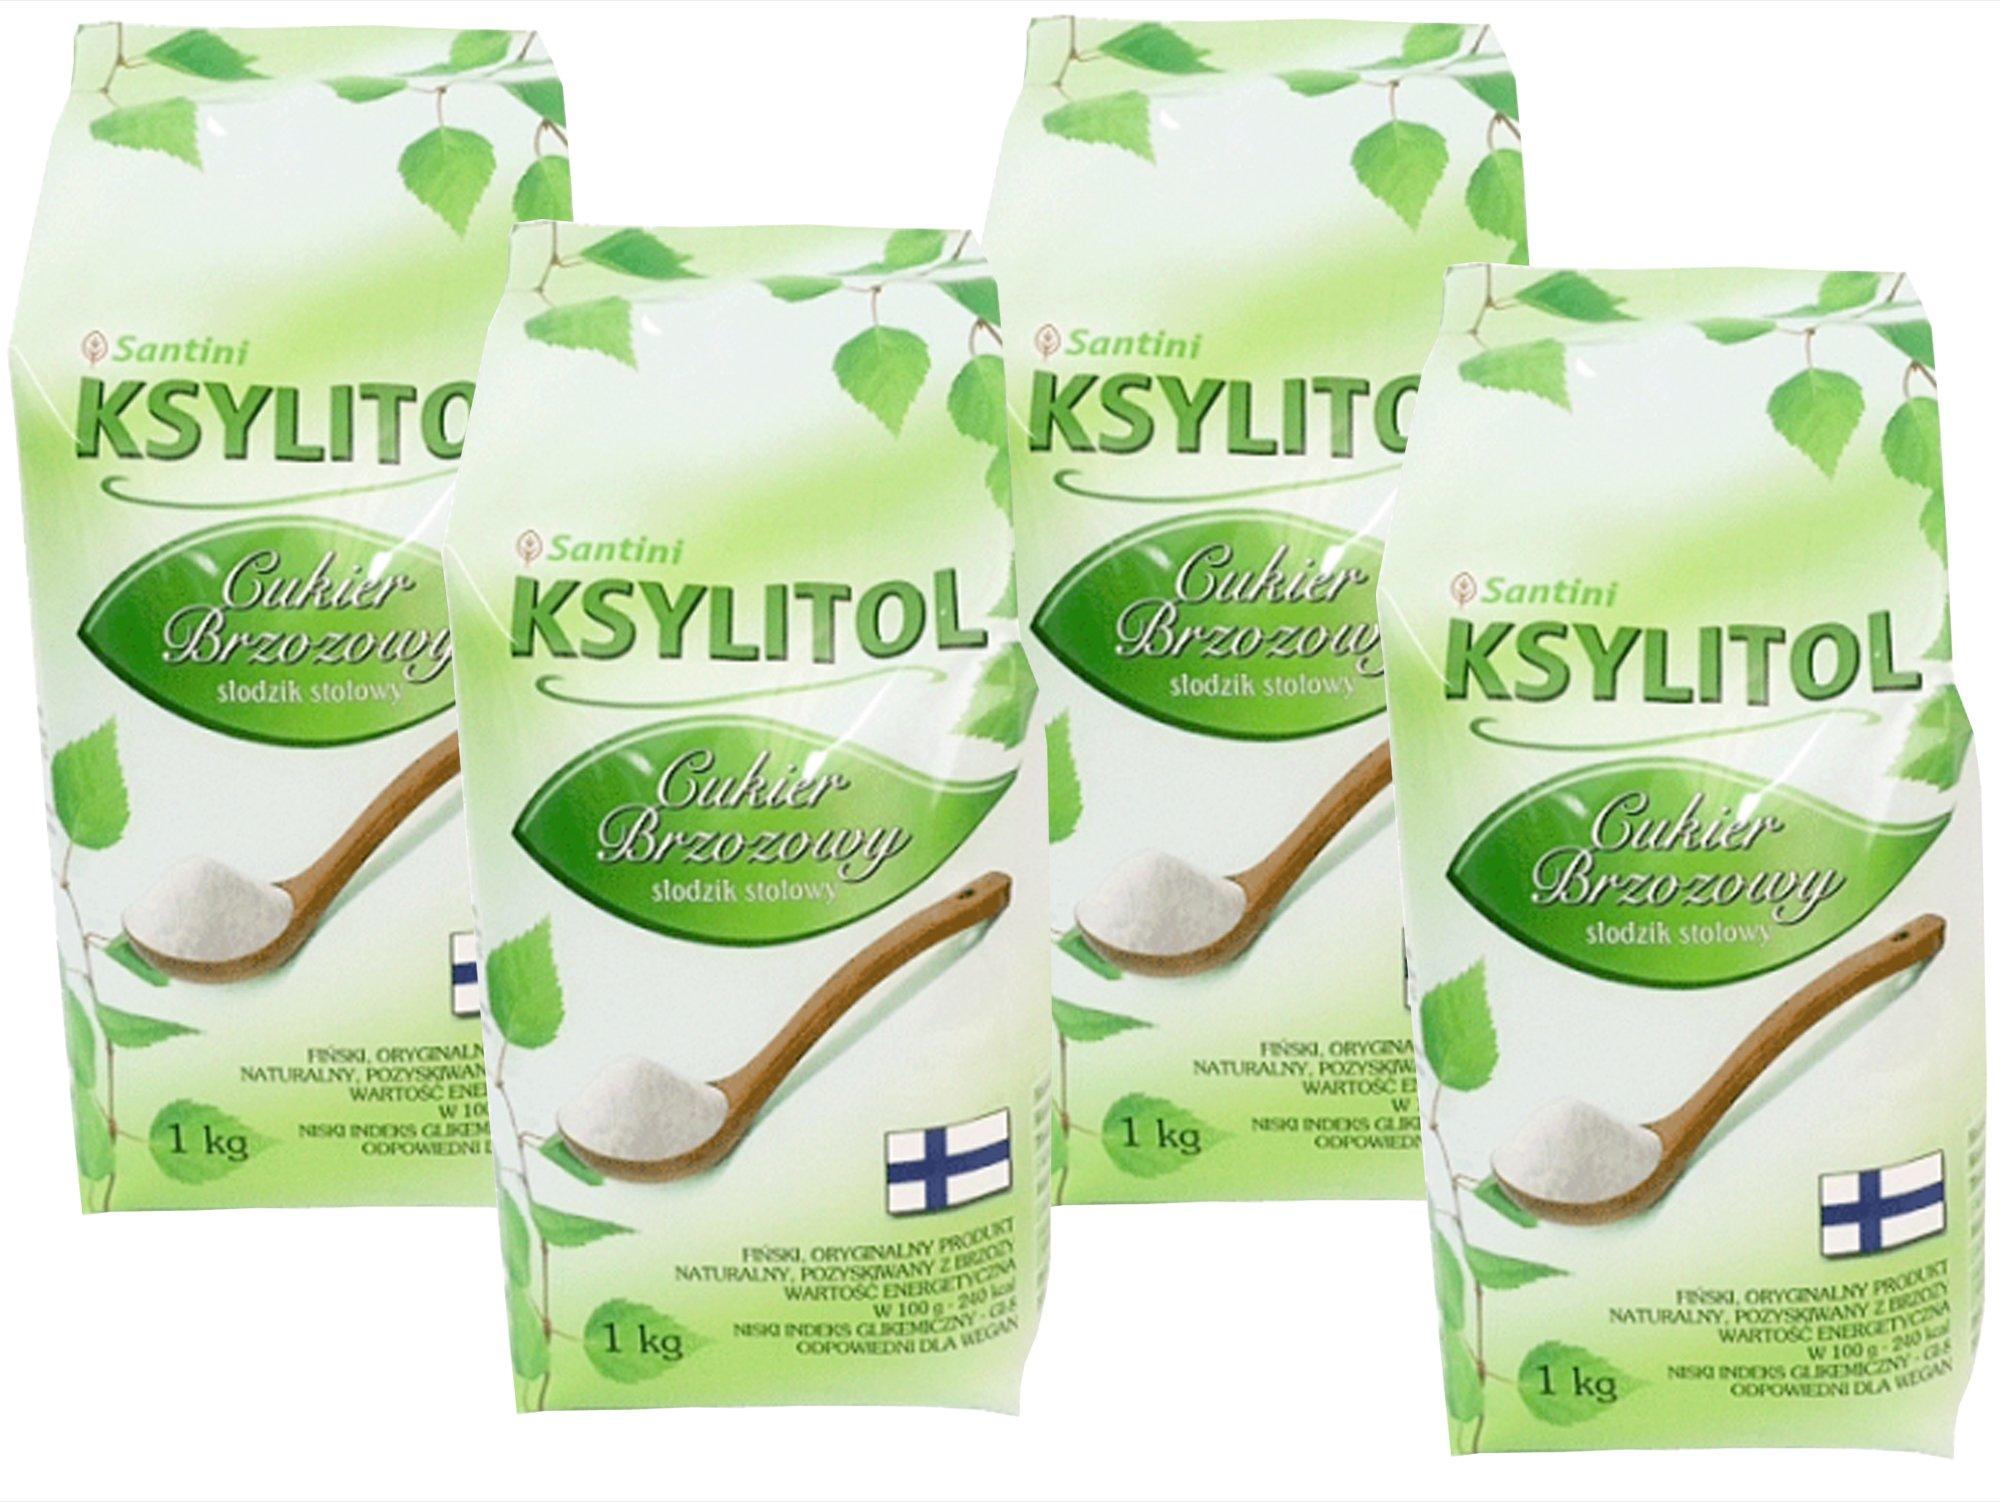 4 kg fínsky XYLITOL 100% breza cukru, ekonomika